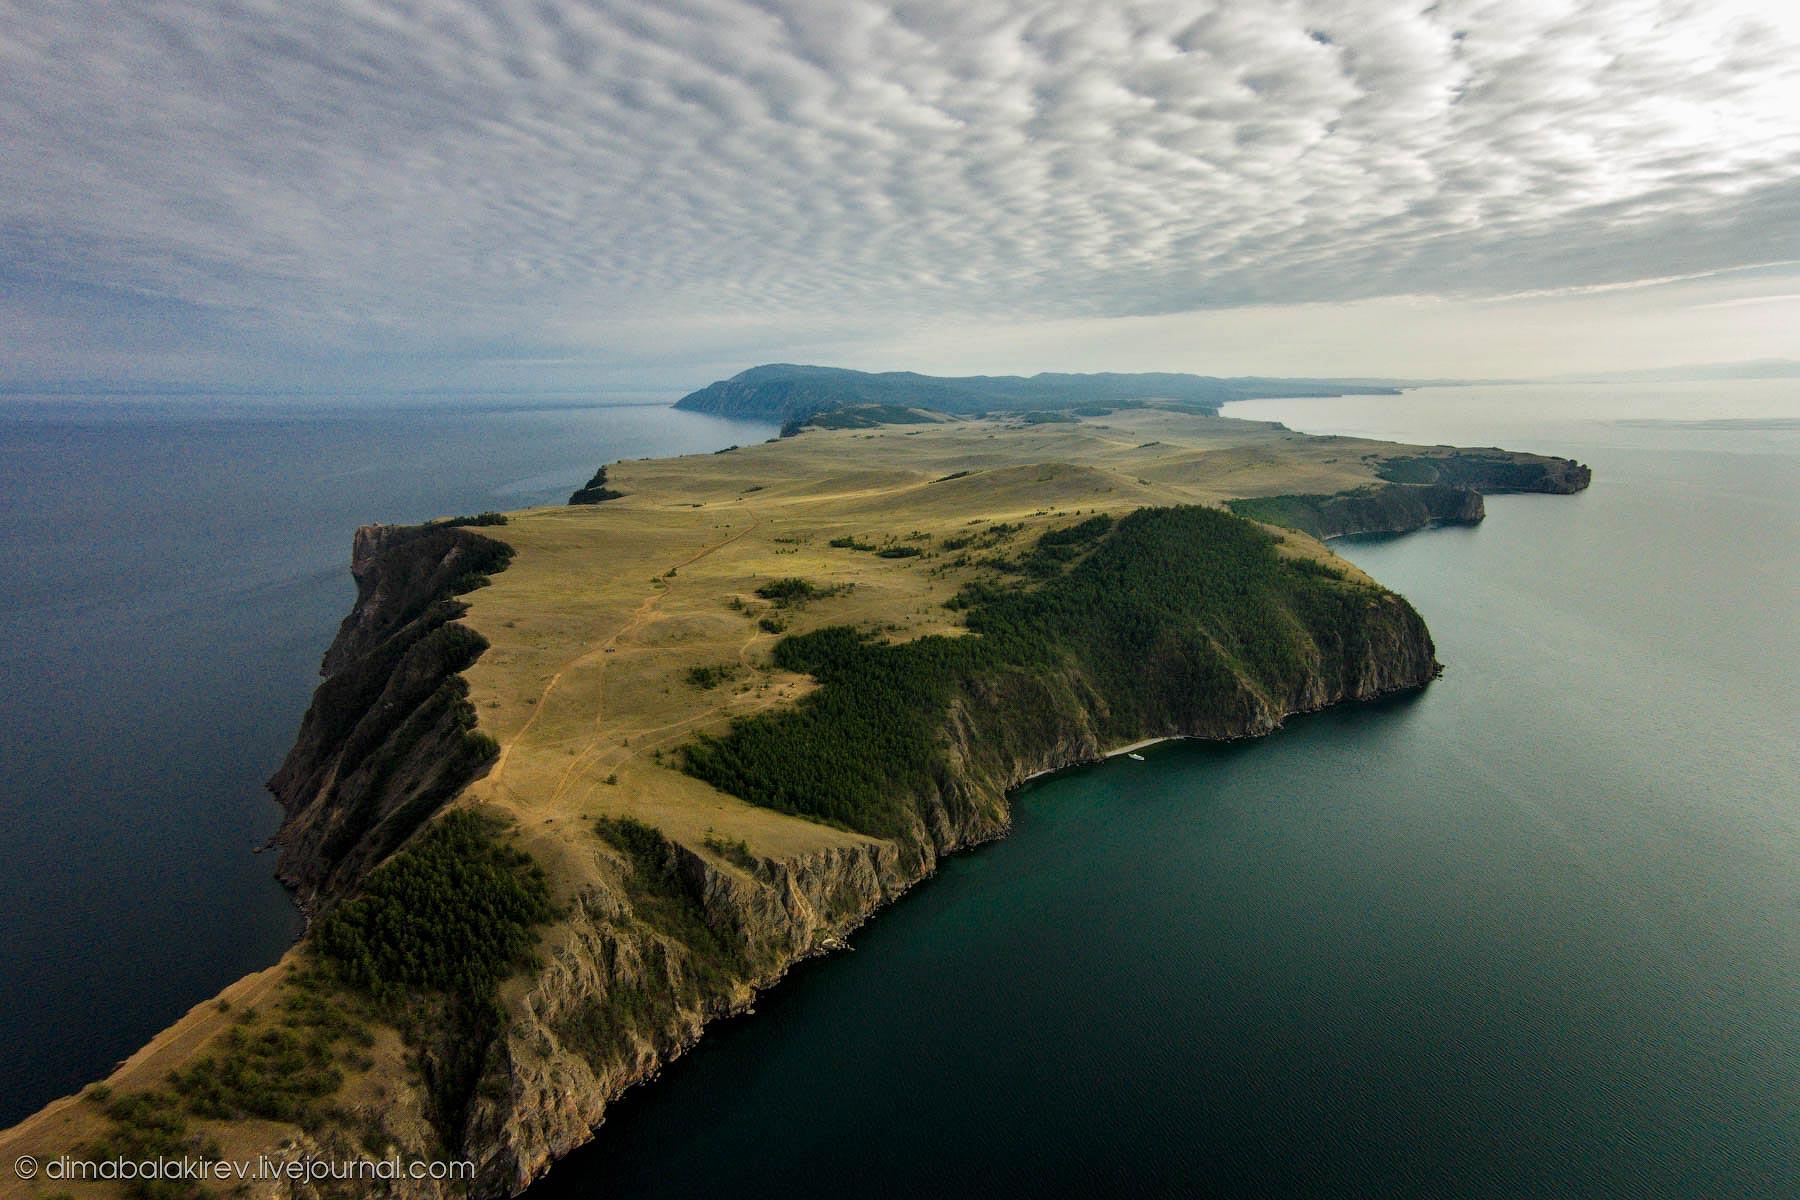 Остров Ольхон, Байкал